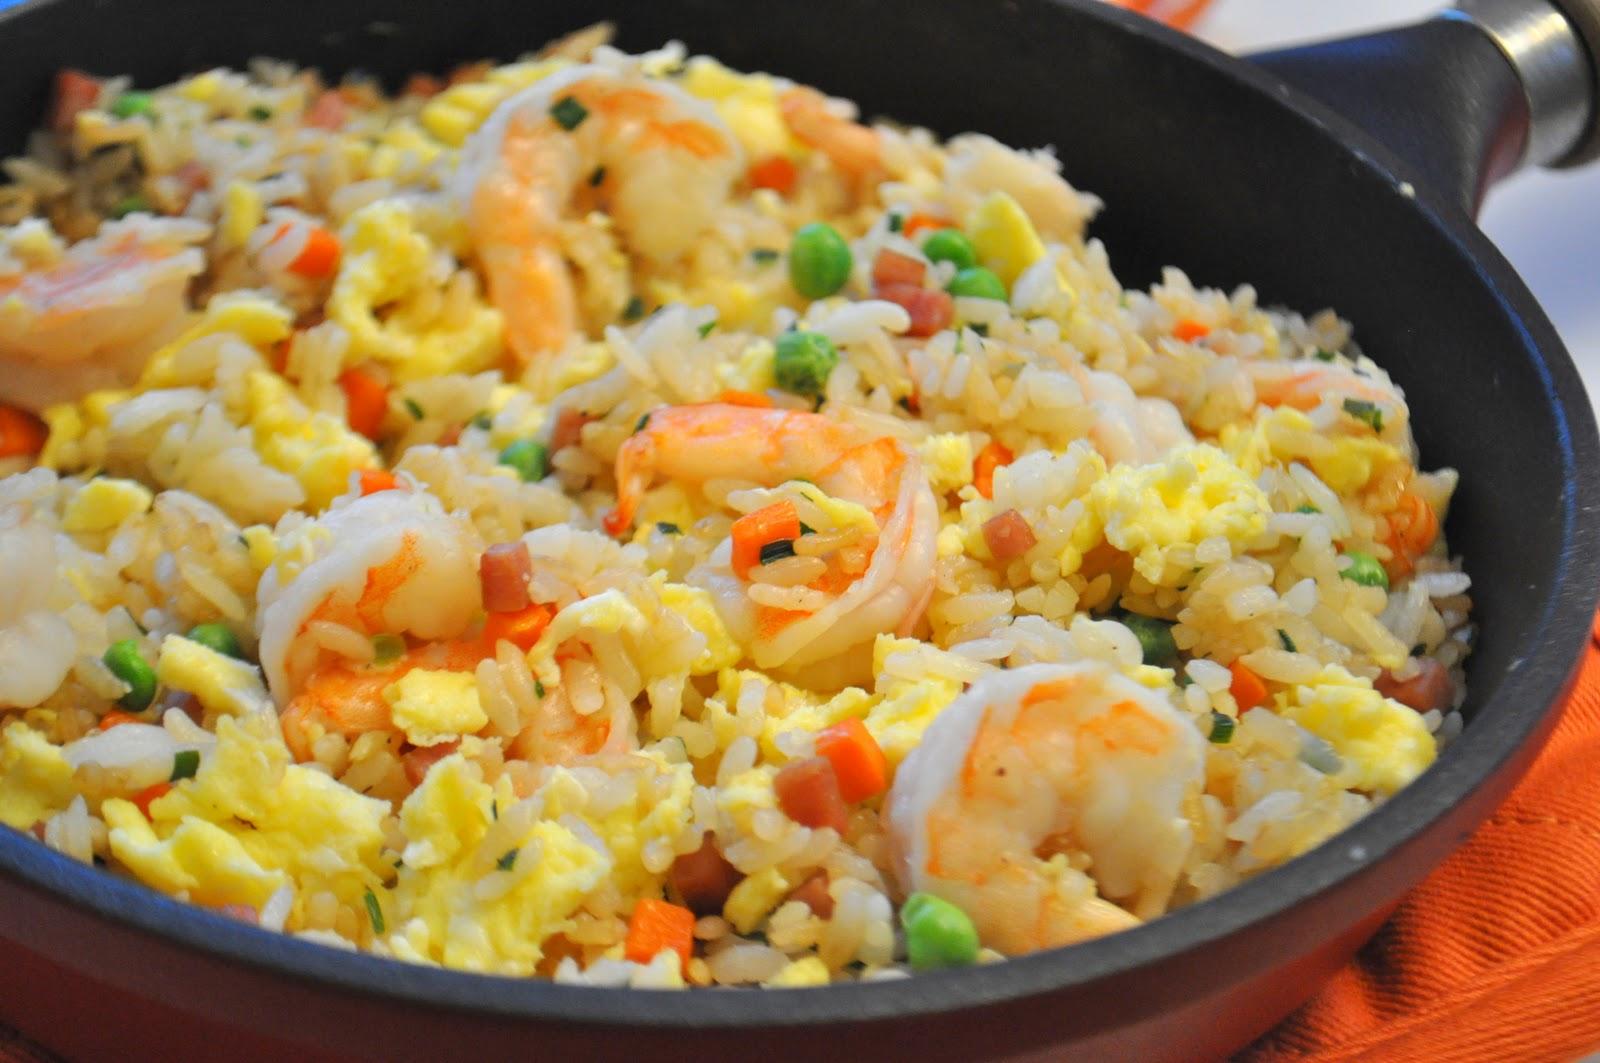 jpg shrimp fried rice photo how to make shrimp fried rice shrimps ...